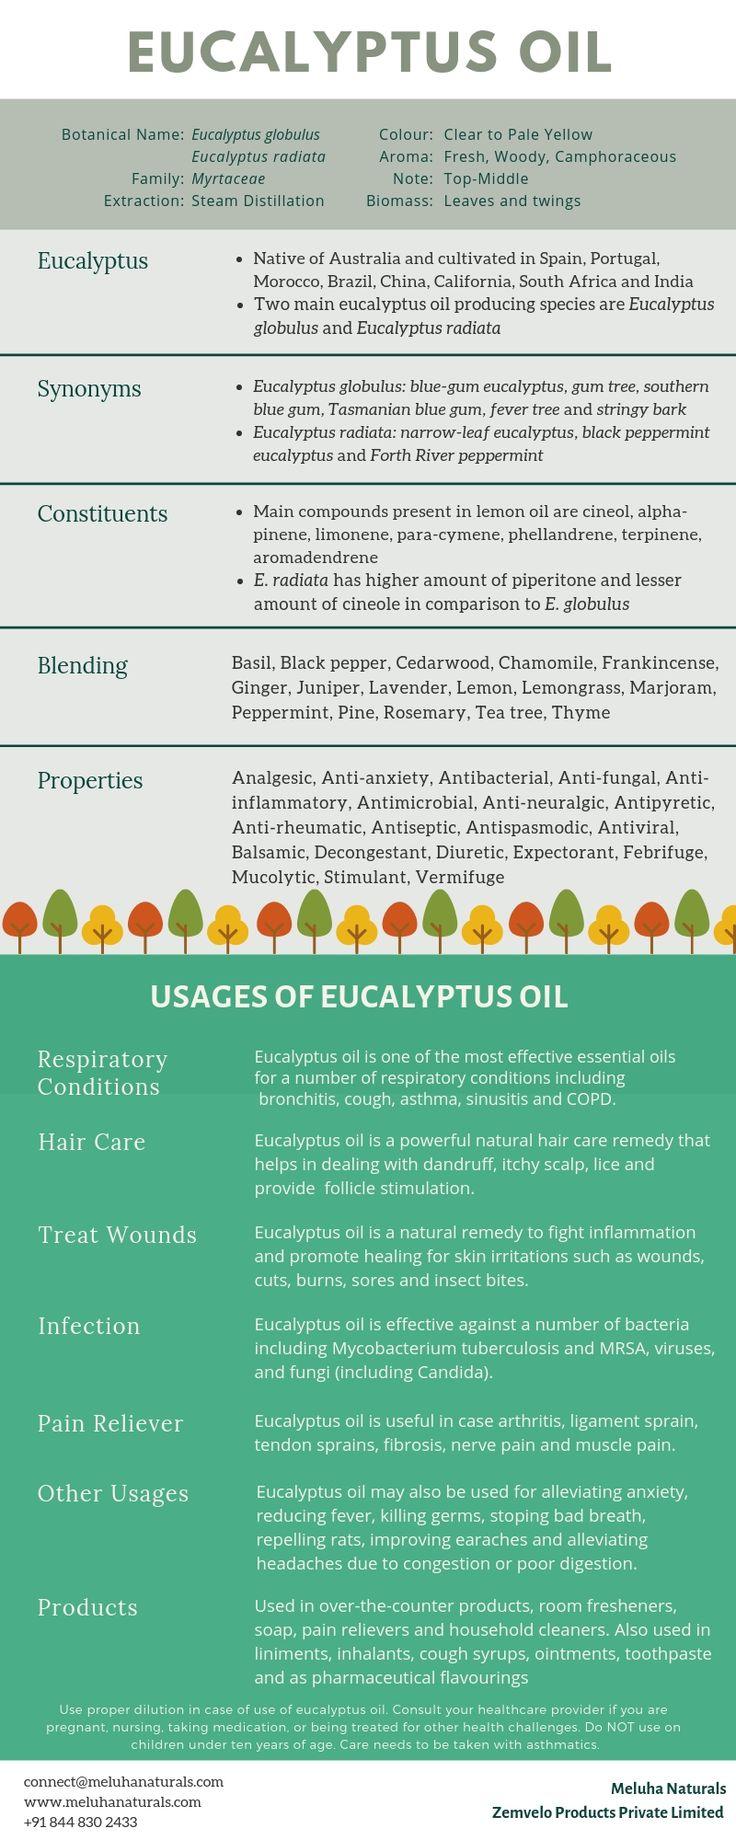 Eucalyptus Oil Guide Benefits, Properties